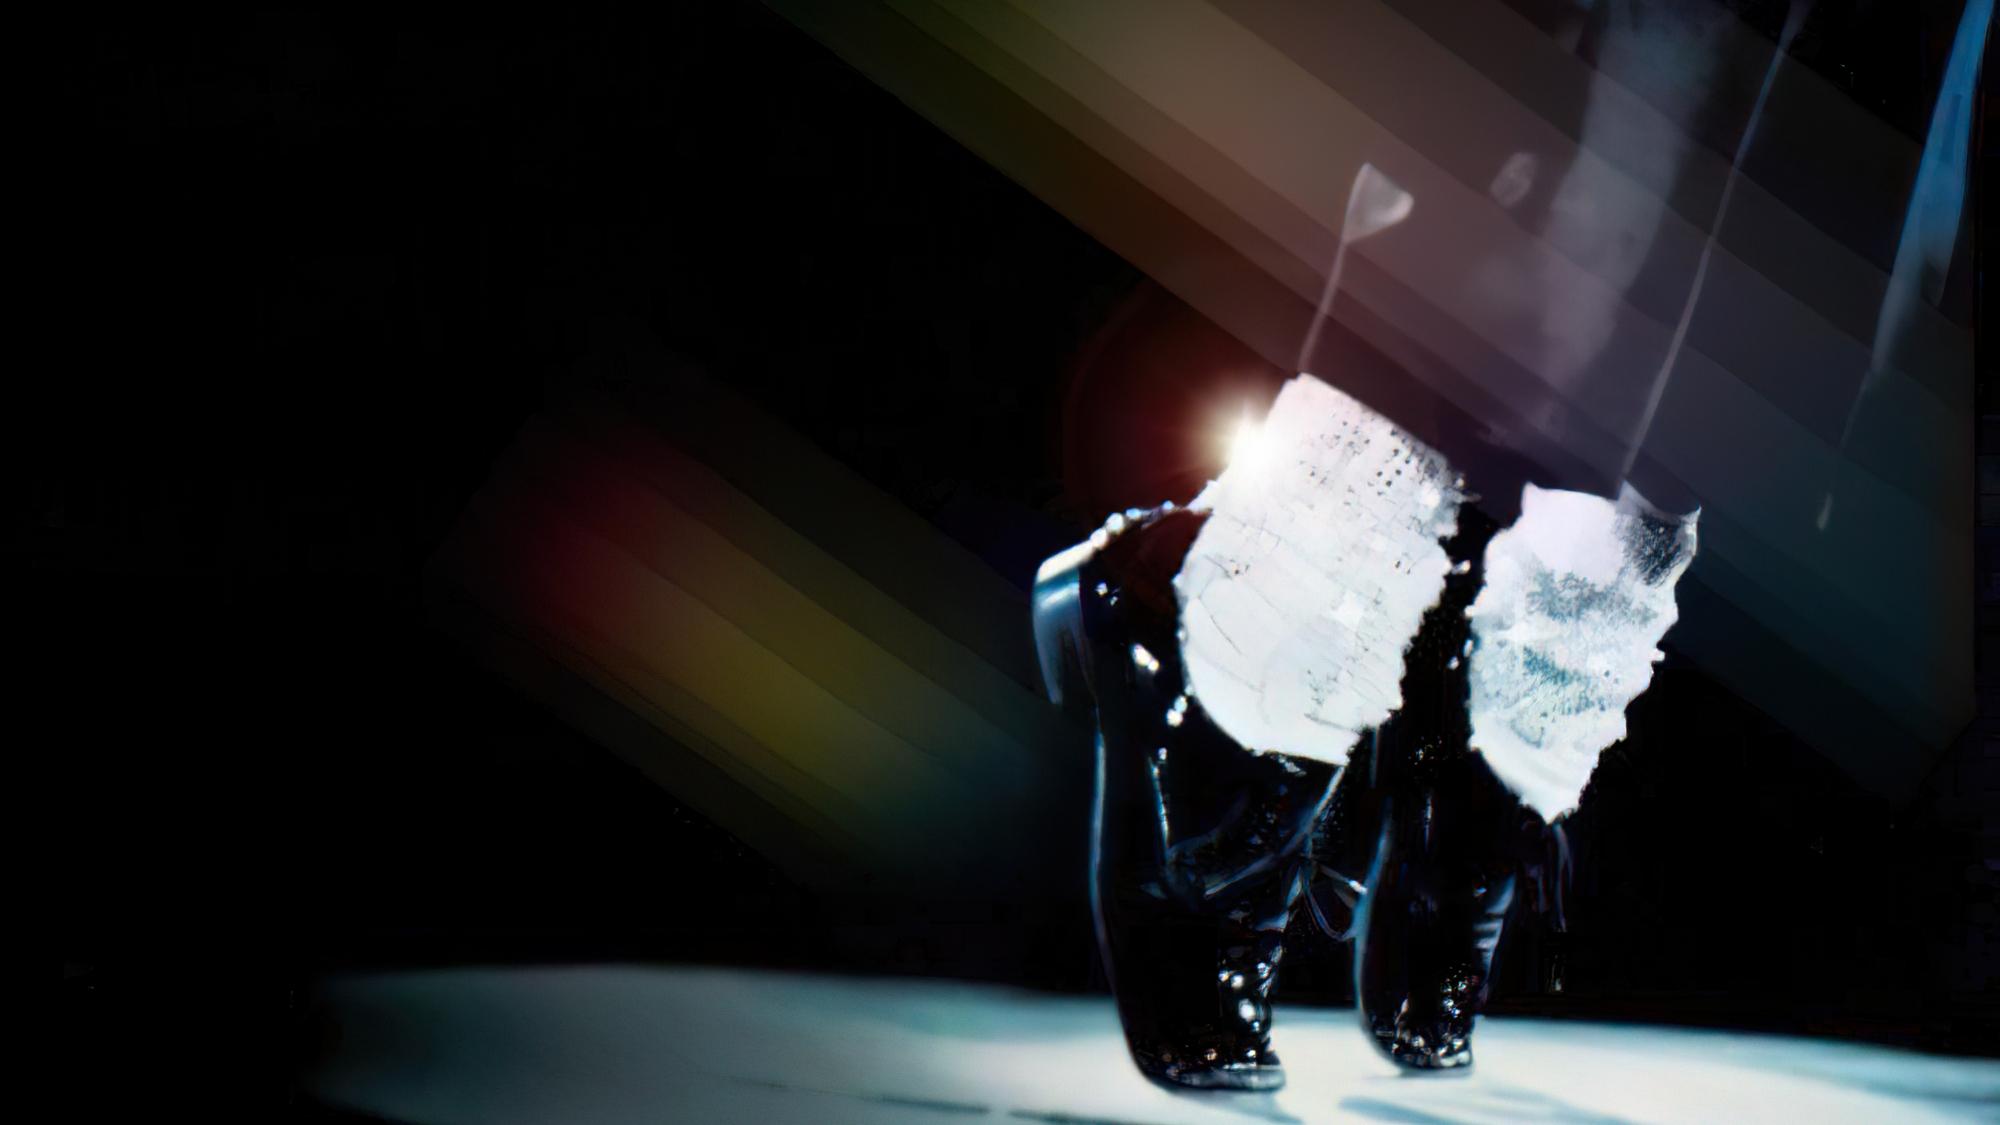 【1080p修复版】迈克尔·杰克逊:MV影像典藏【123】【收藏级画质】